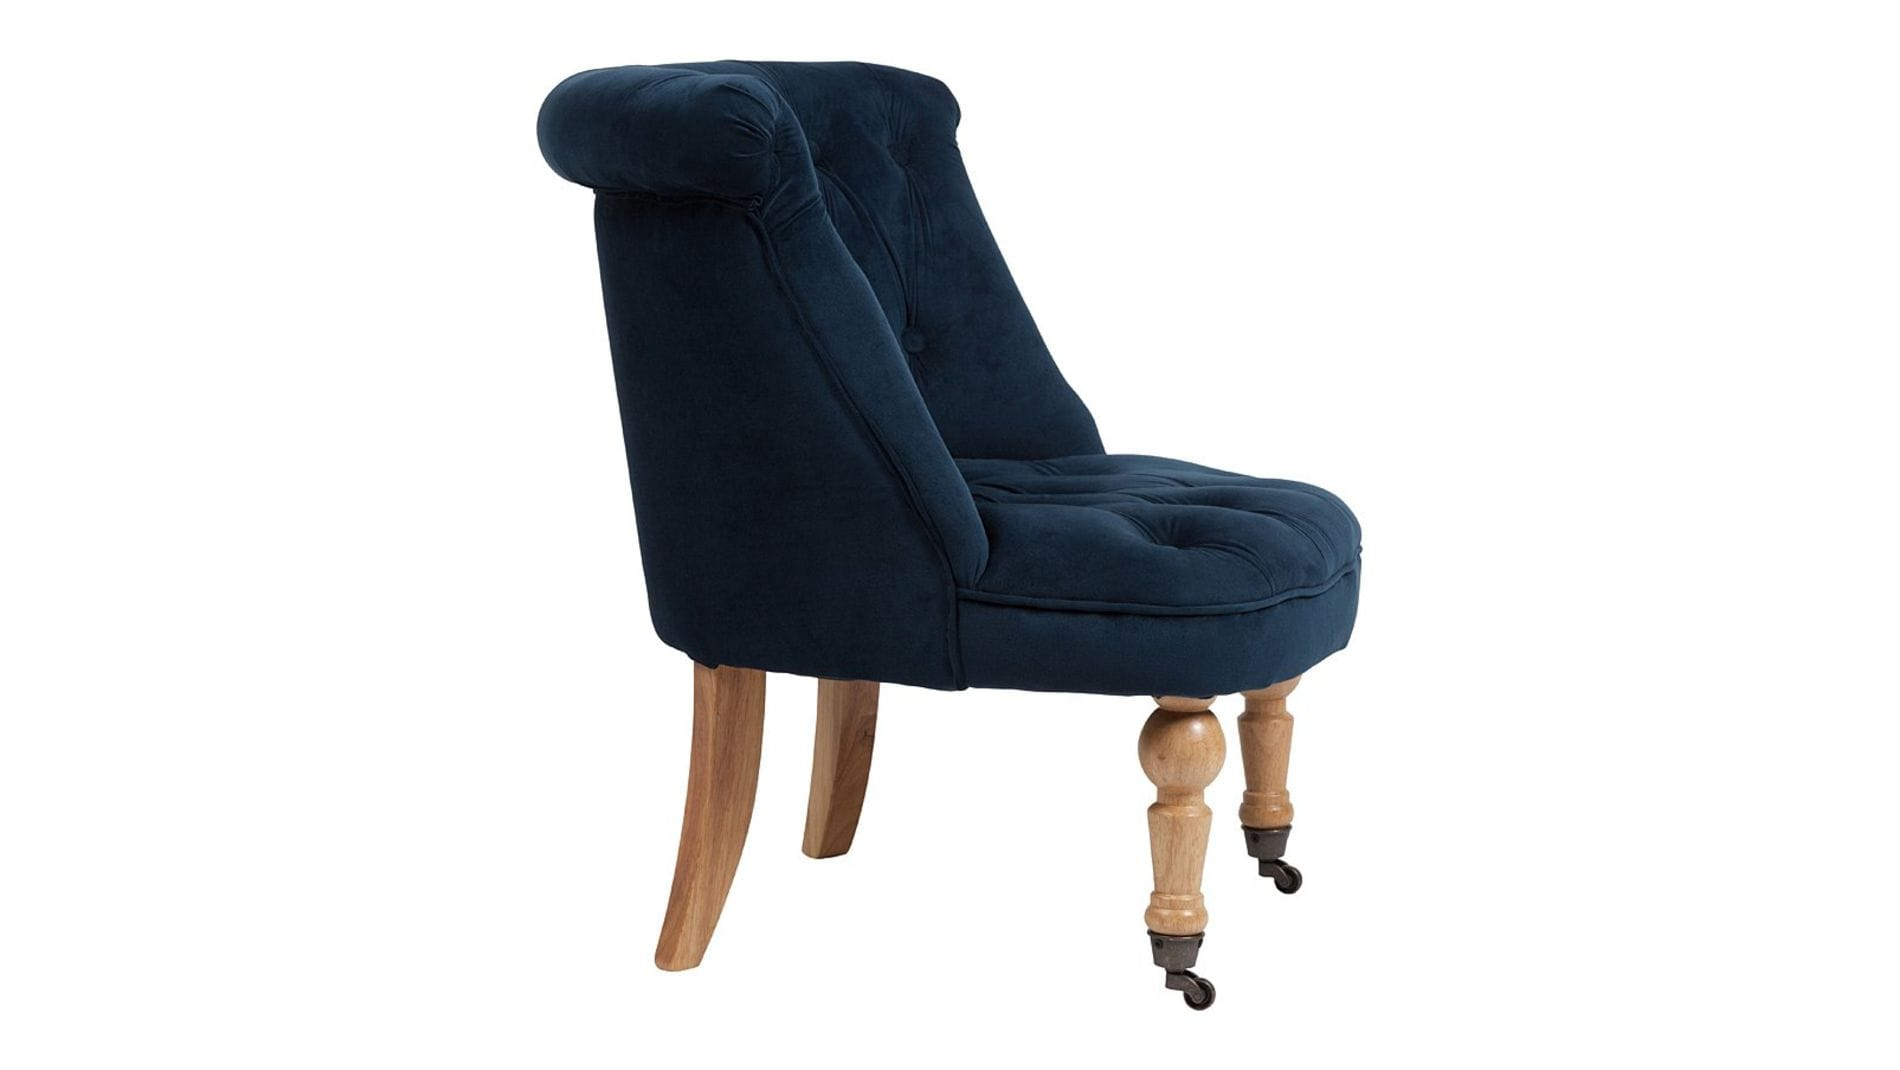 Кресло Amelie French Country Chair Синий Велюр М